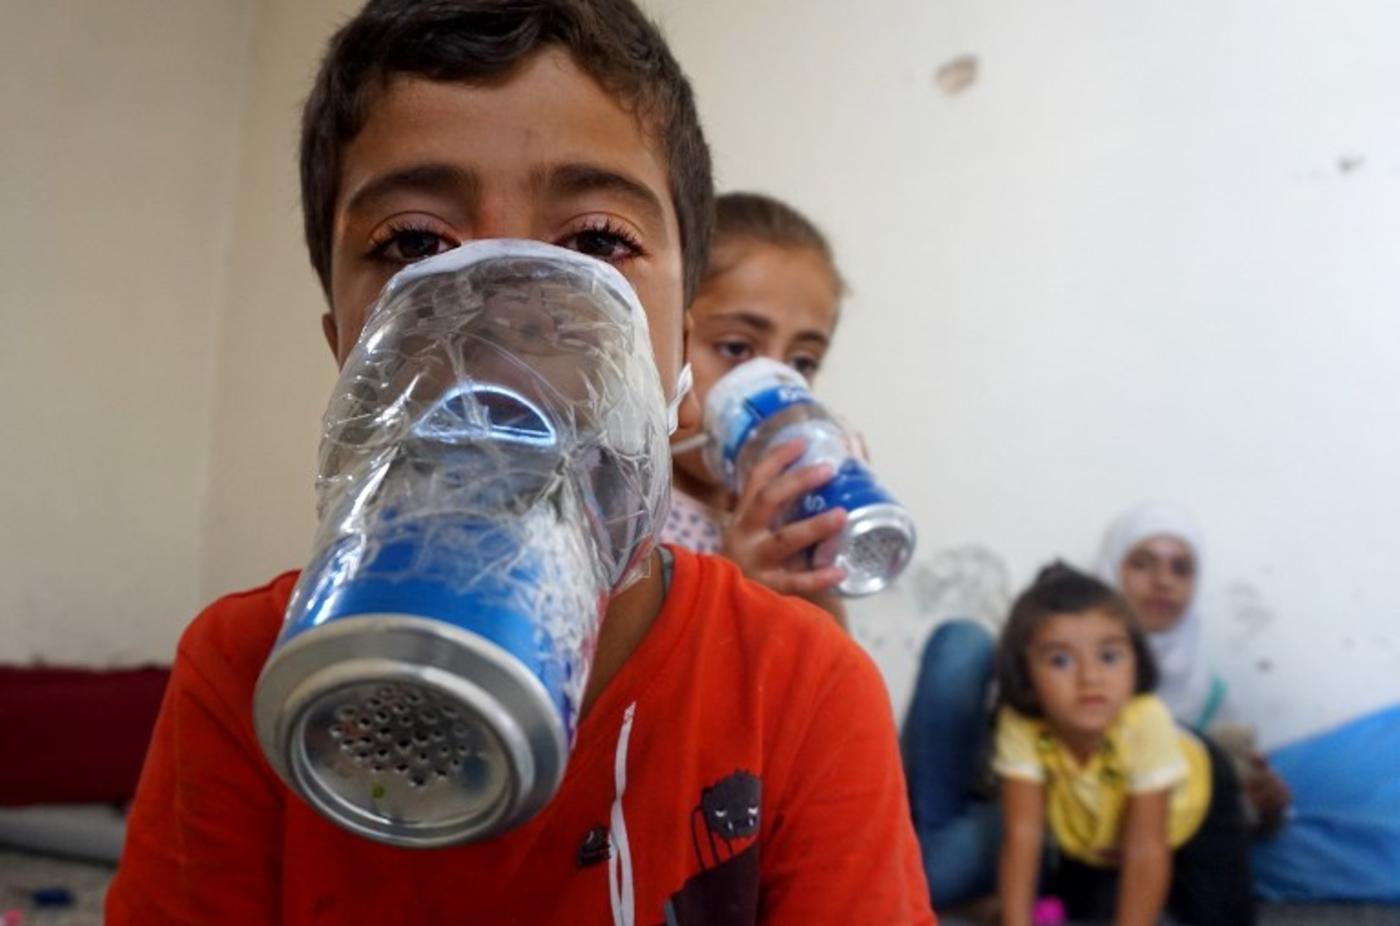 UN judge set to open war crimes cases over Syrian civil war